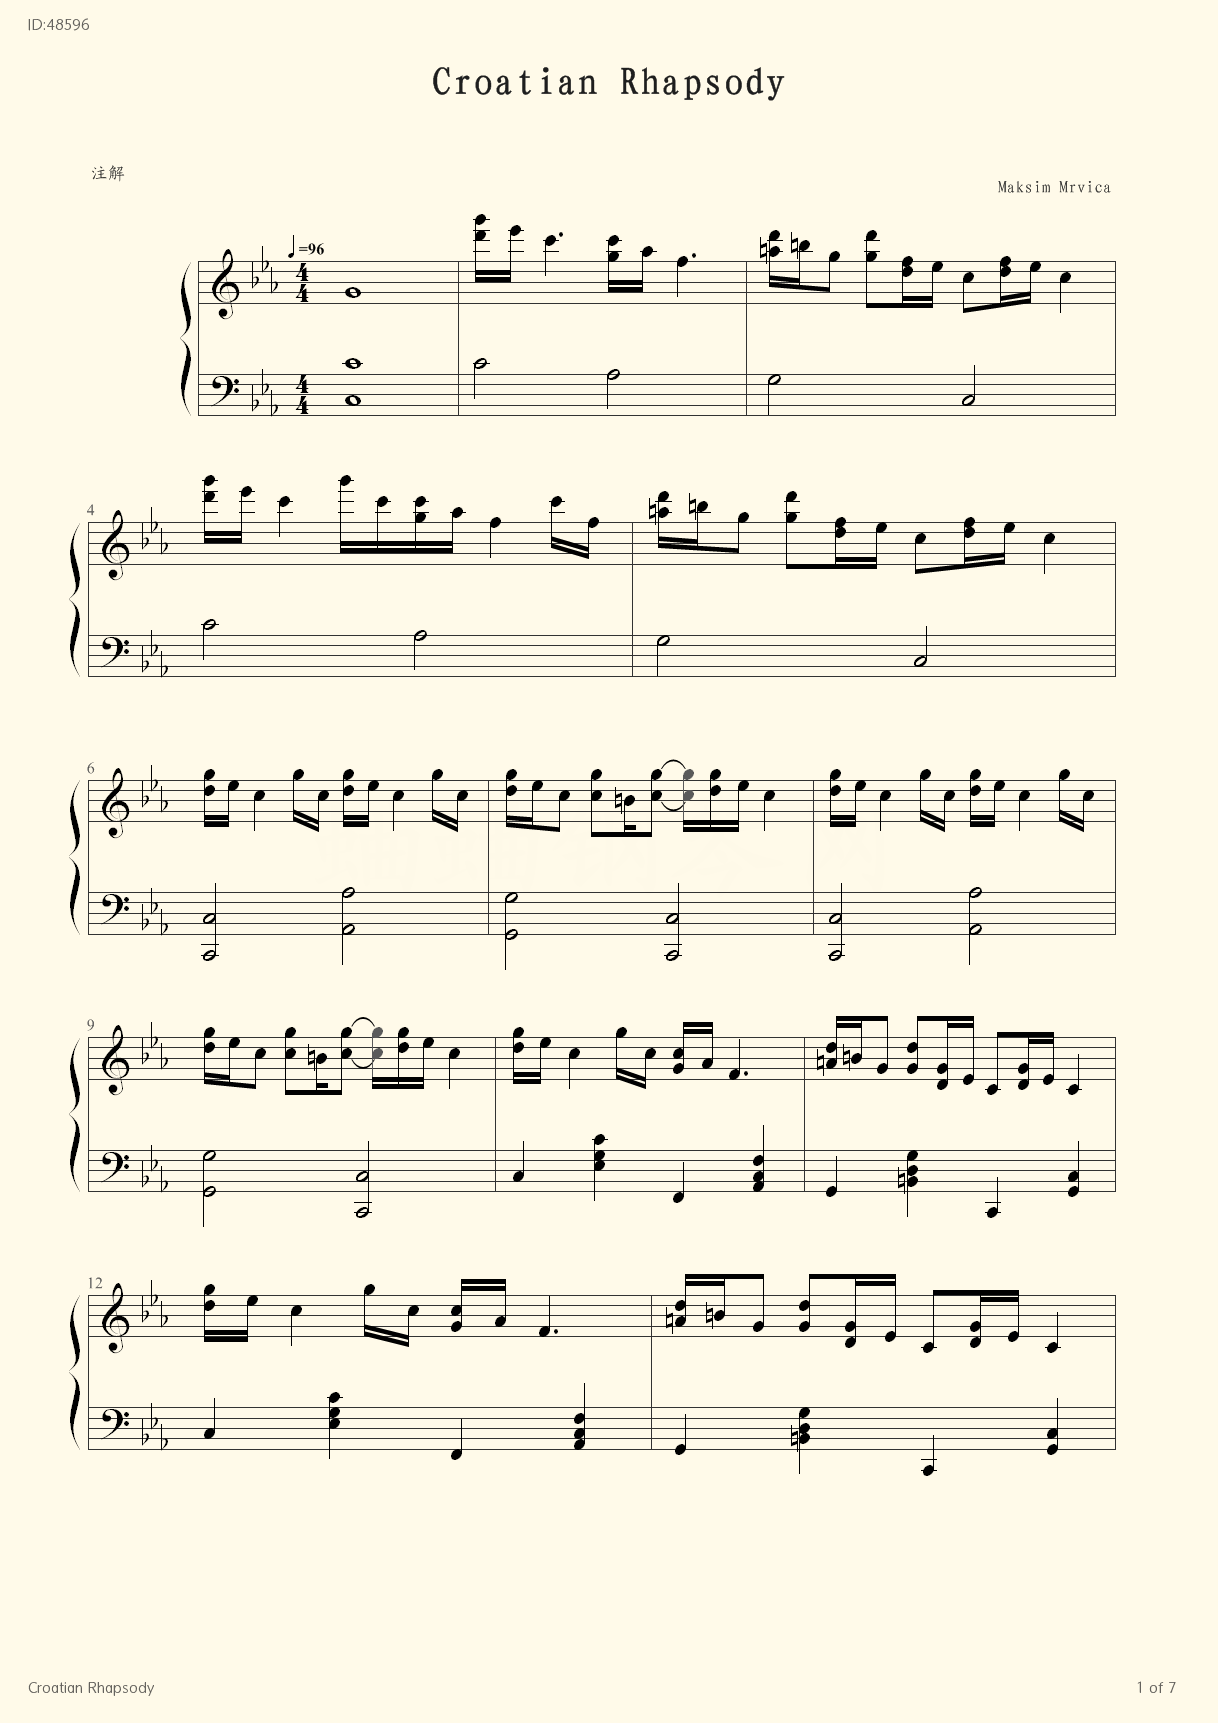 Croatian Rhapsody   - Maksim Mrvica - first page